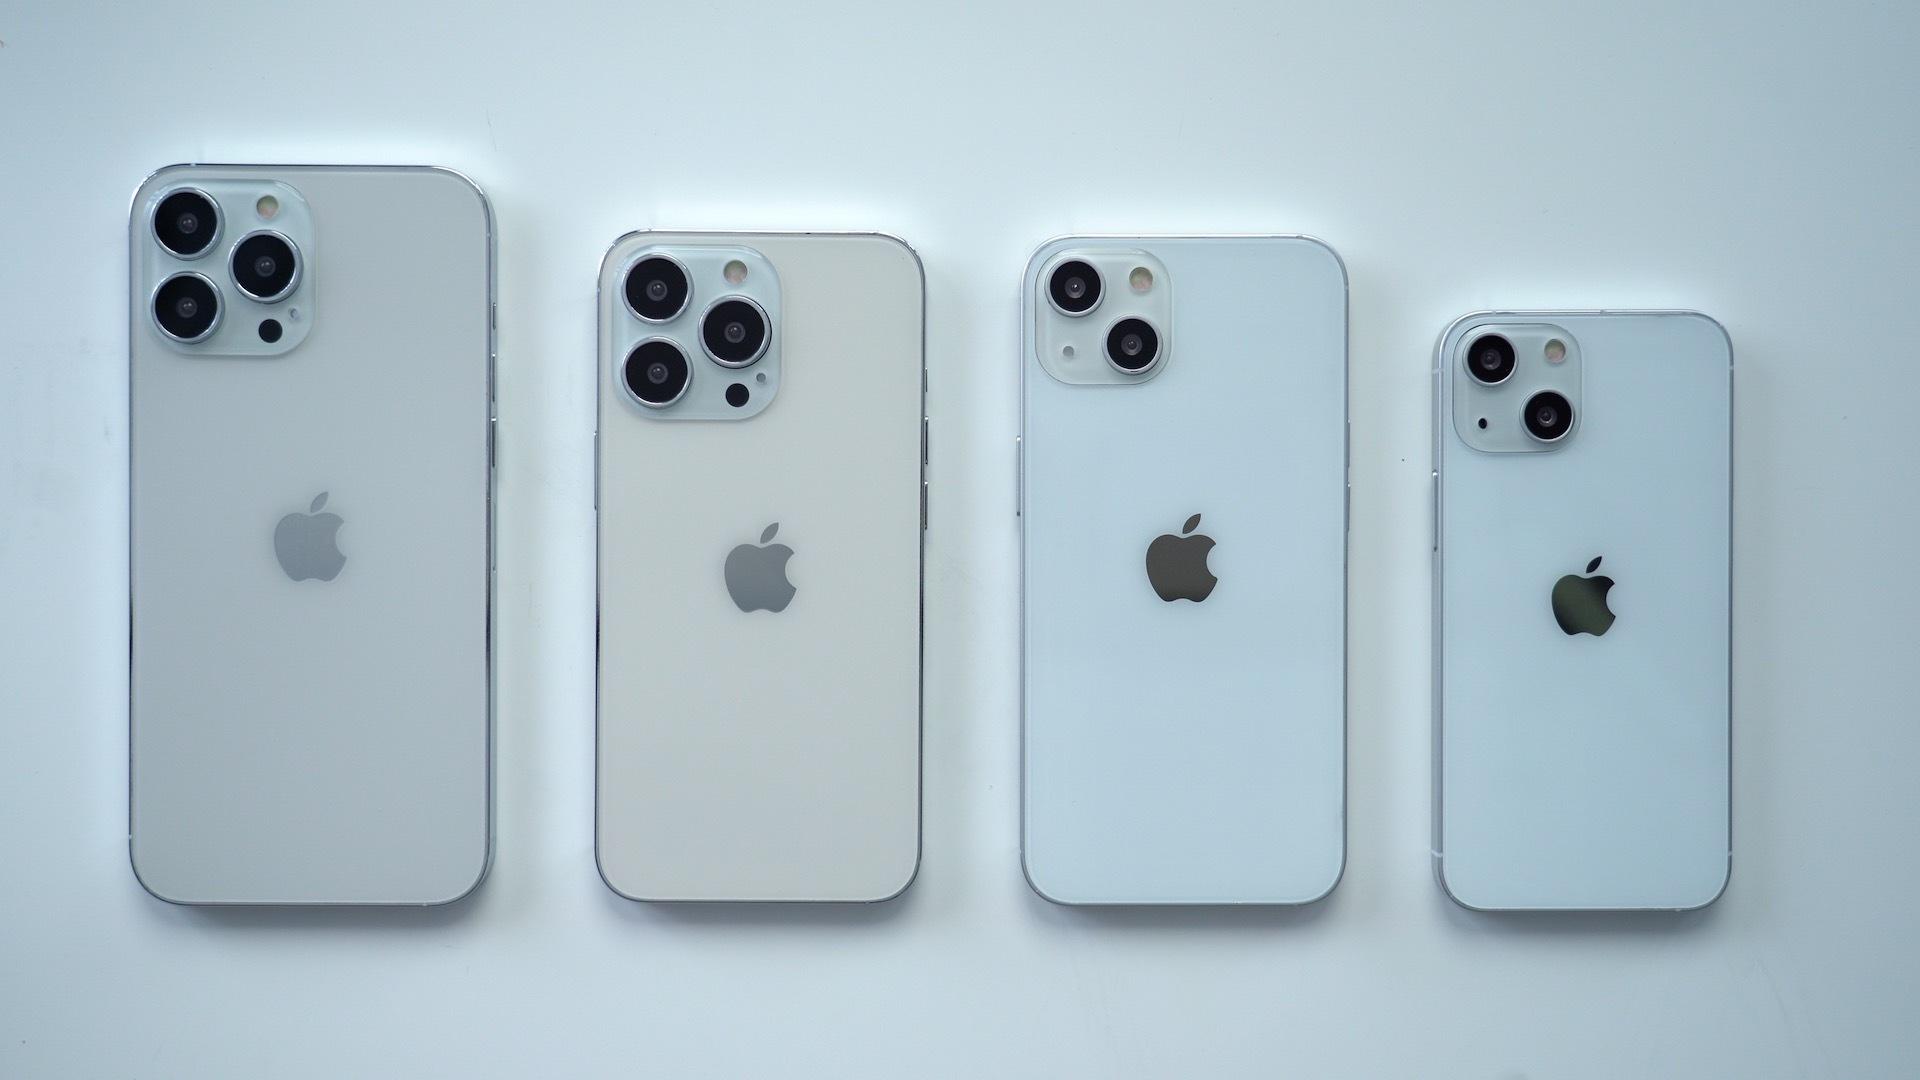 iphone-13-dummy-model-lineup